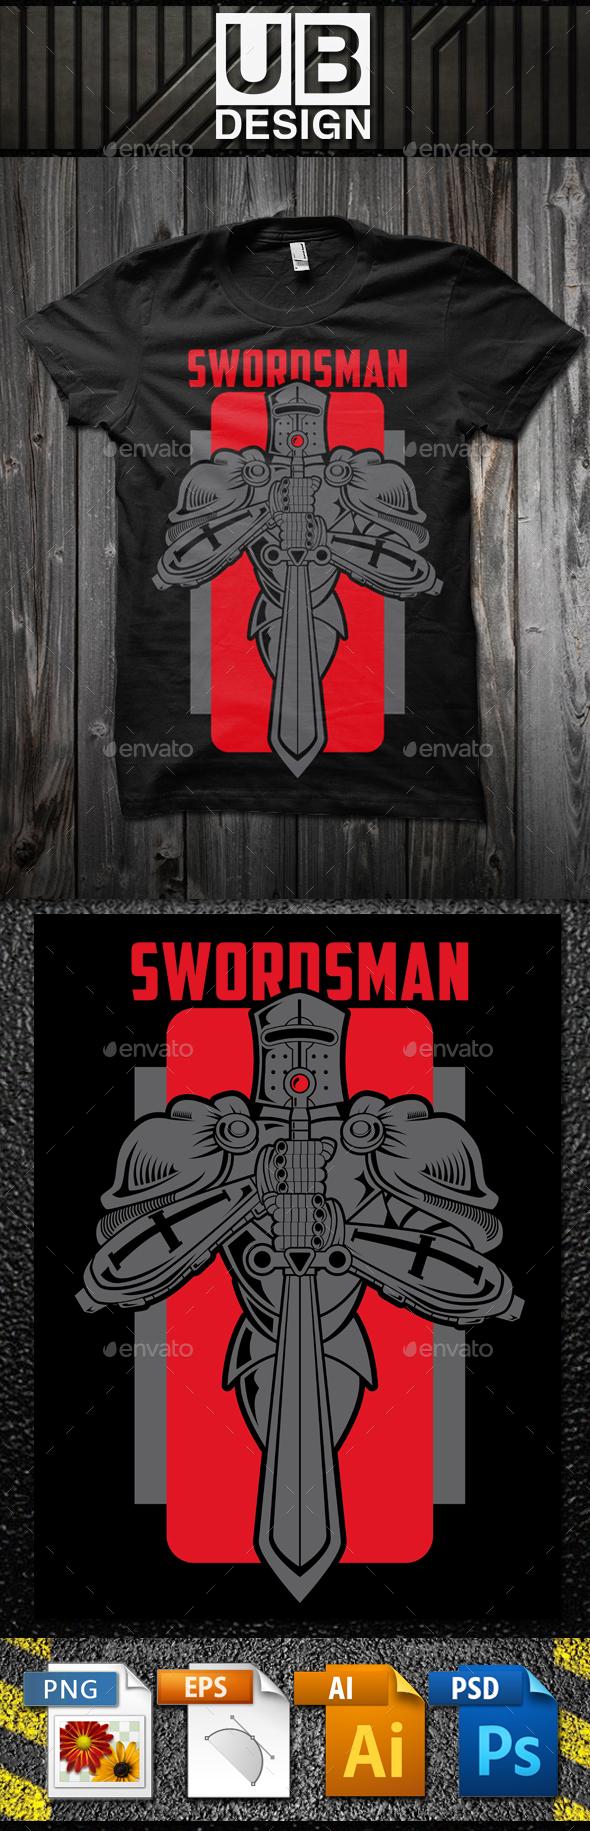 Swordsman T-shirt Template - Designs T-Shirts